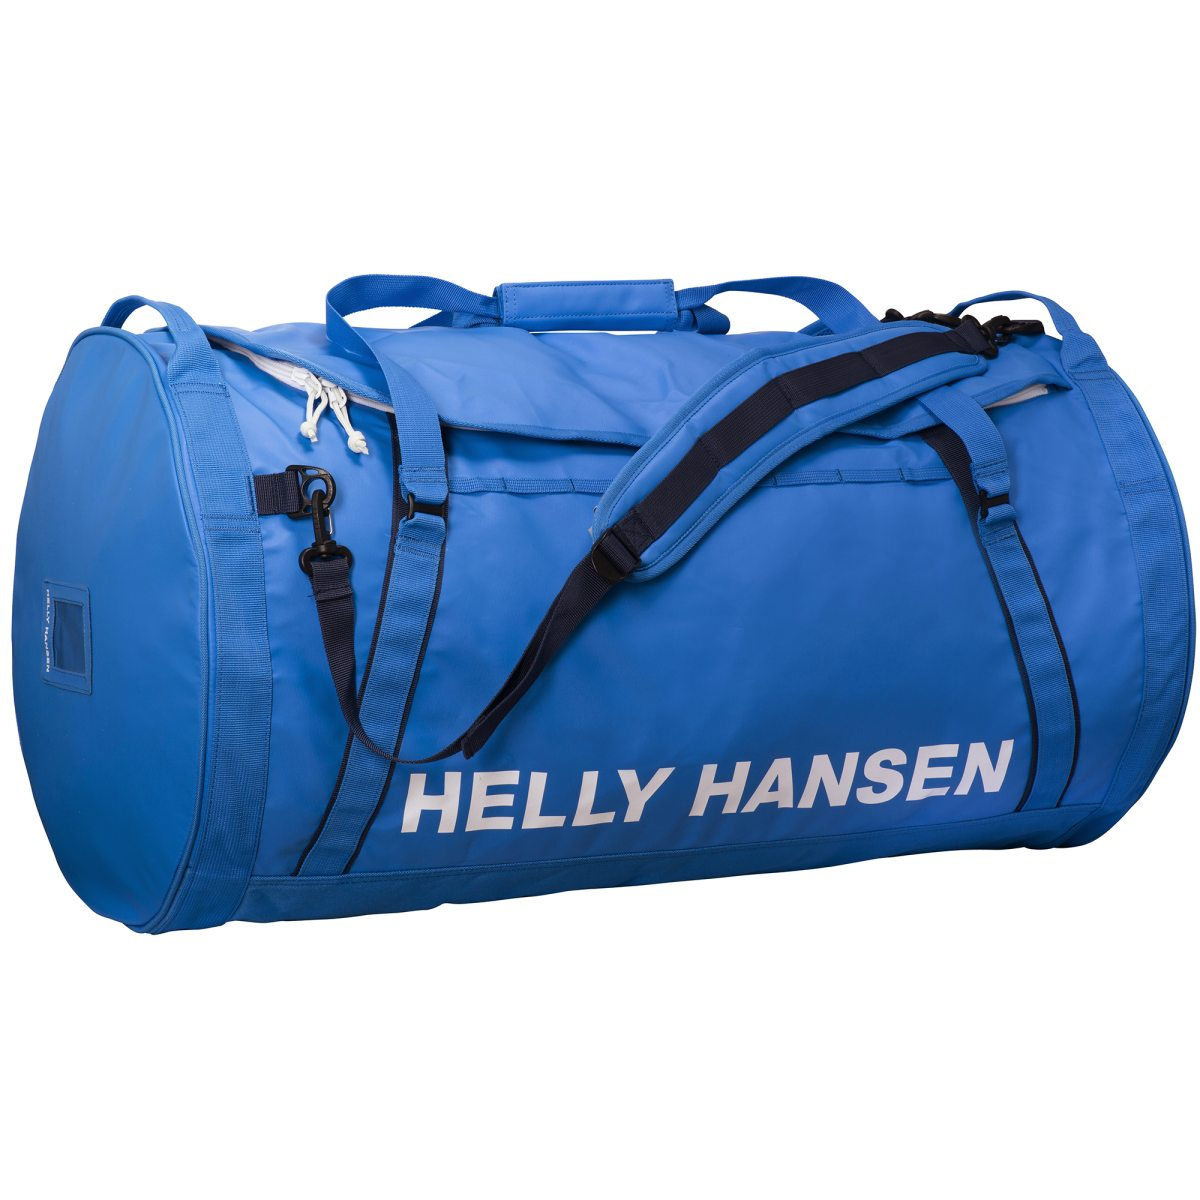 Snickers vattentät duffel bag väska, 40 liter, Gul